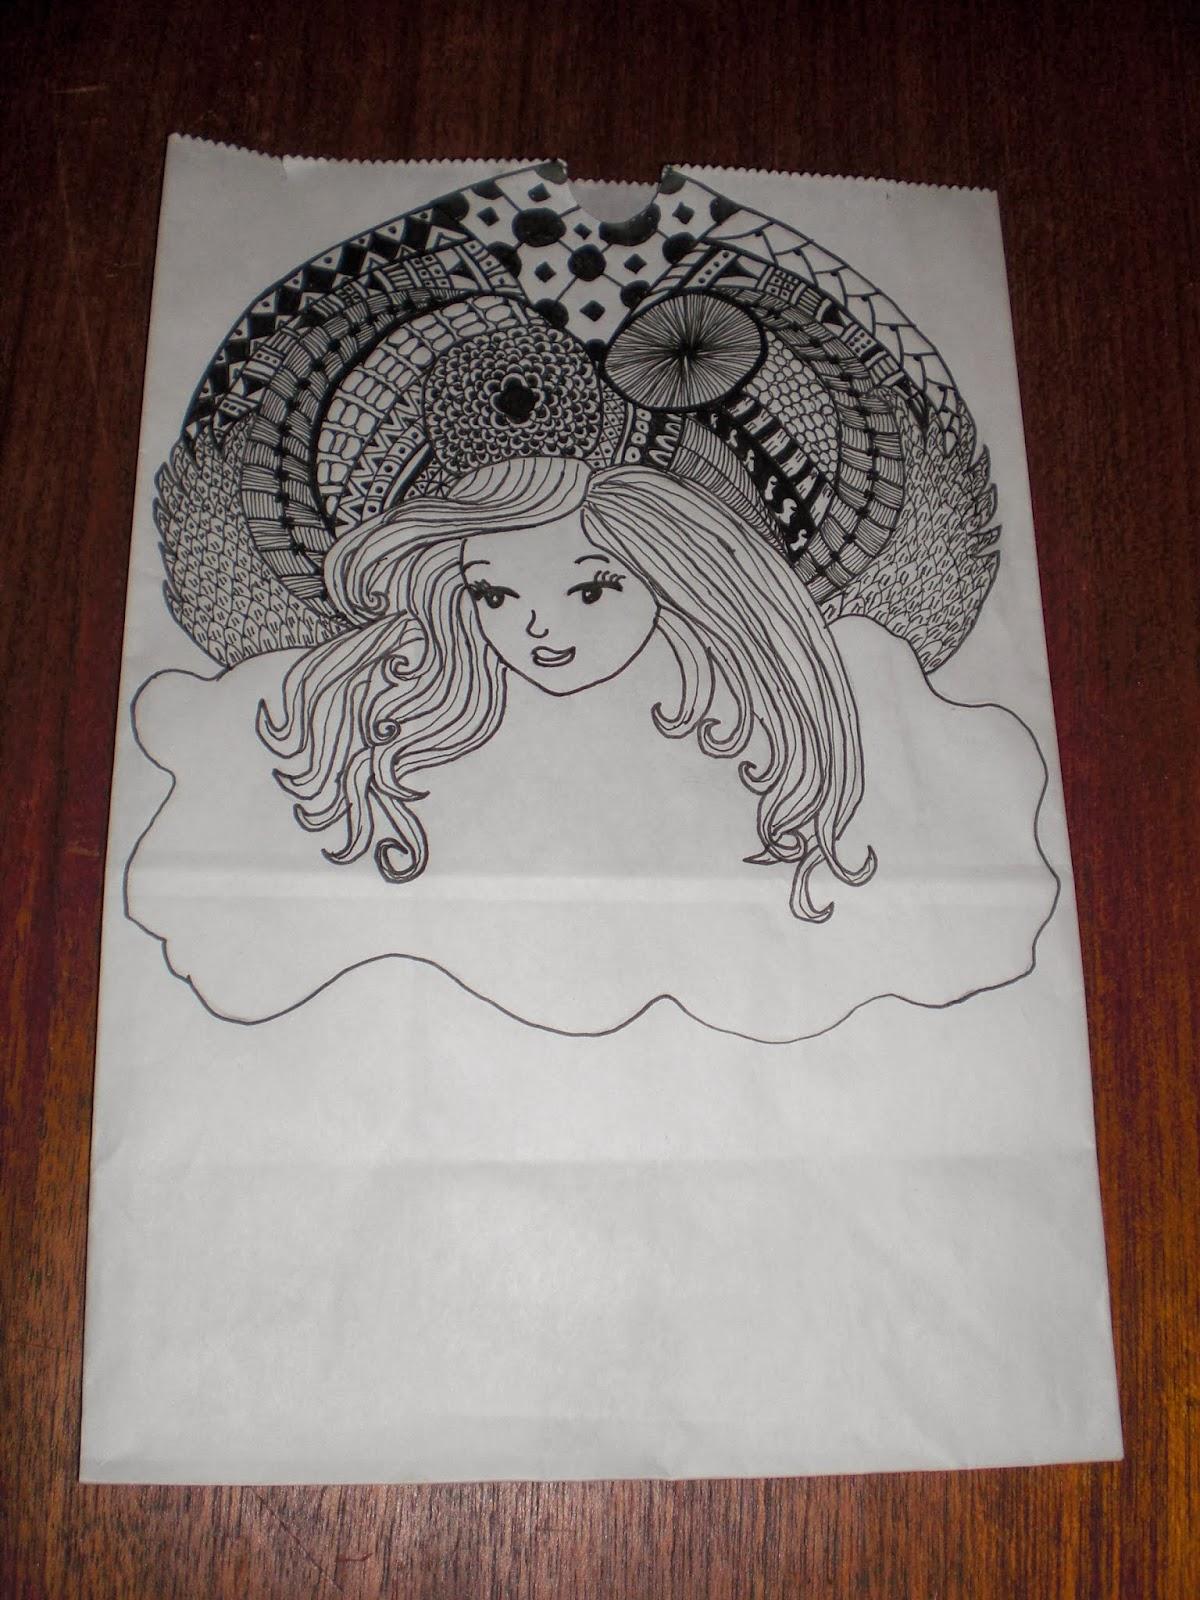 Zentangle krusedulle tegnet på lyspose for Kræftens Bekæmpelse